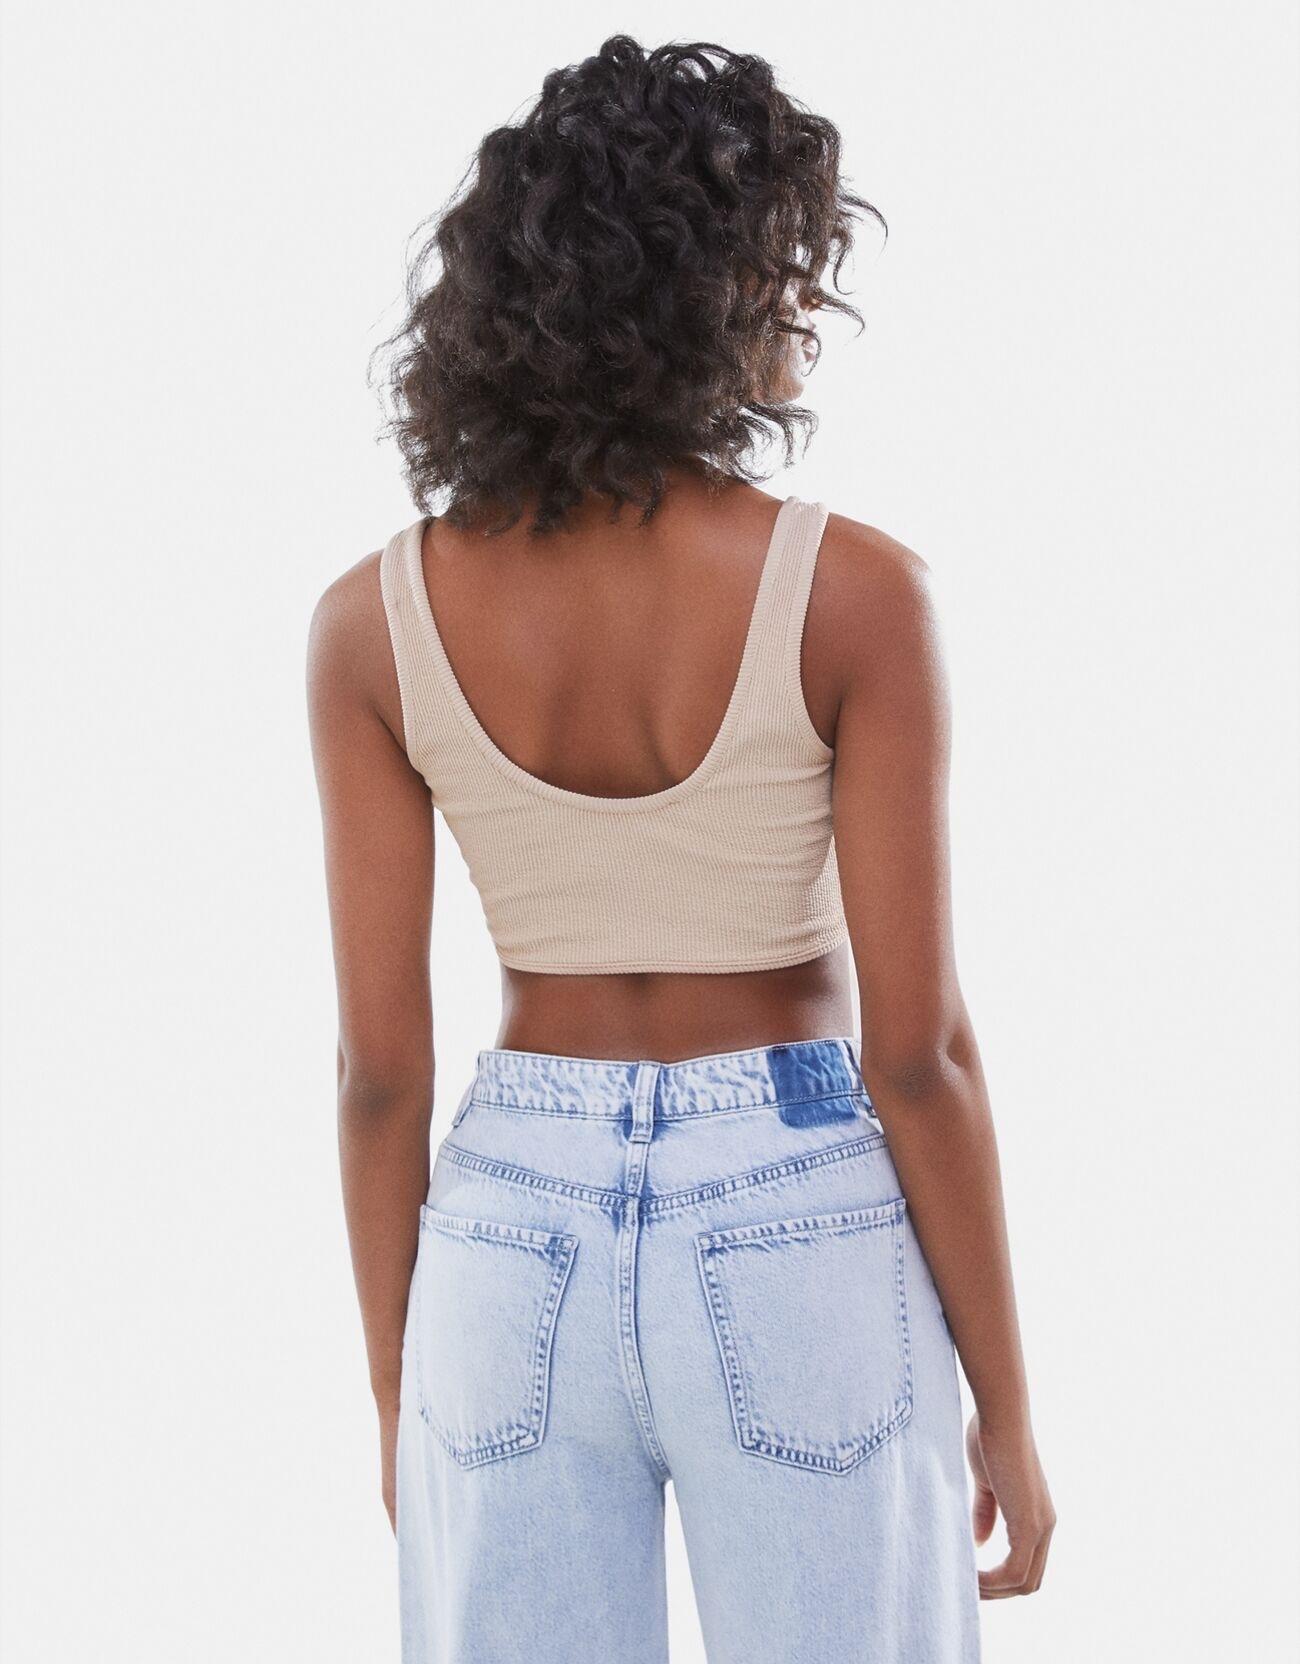 product-2021 Summer Custom Breathable Women Knit Ribbed Vest Y2k Sexy Slim Fitness Basic Sleeveless